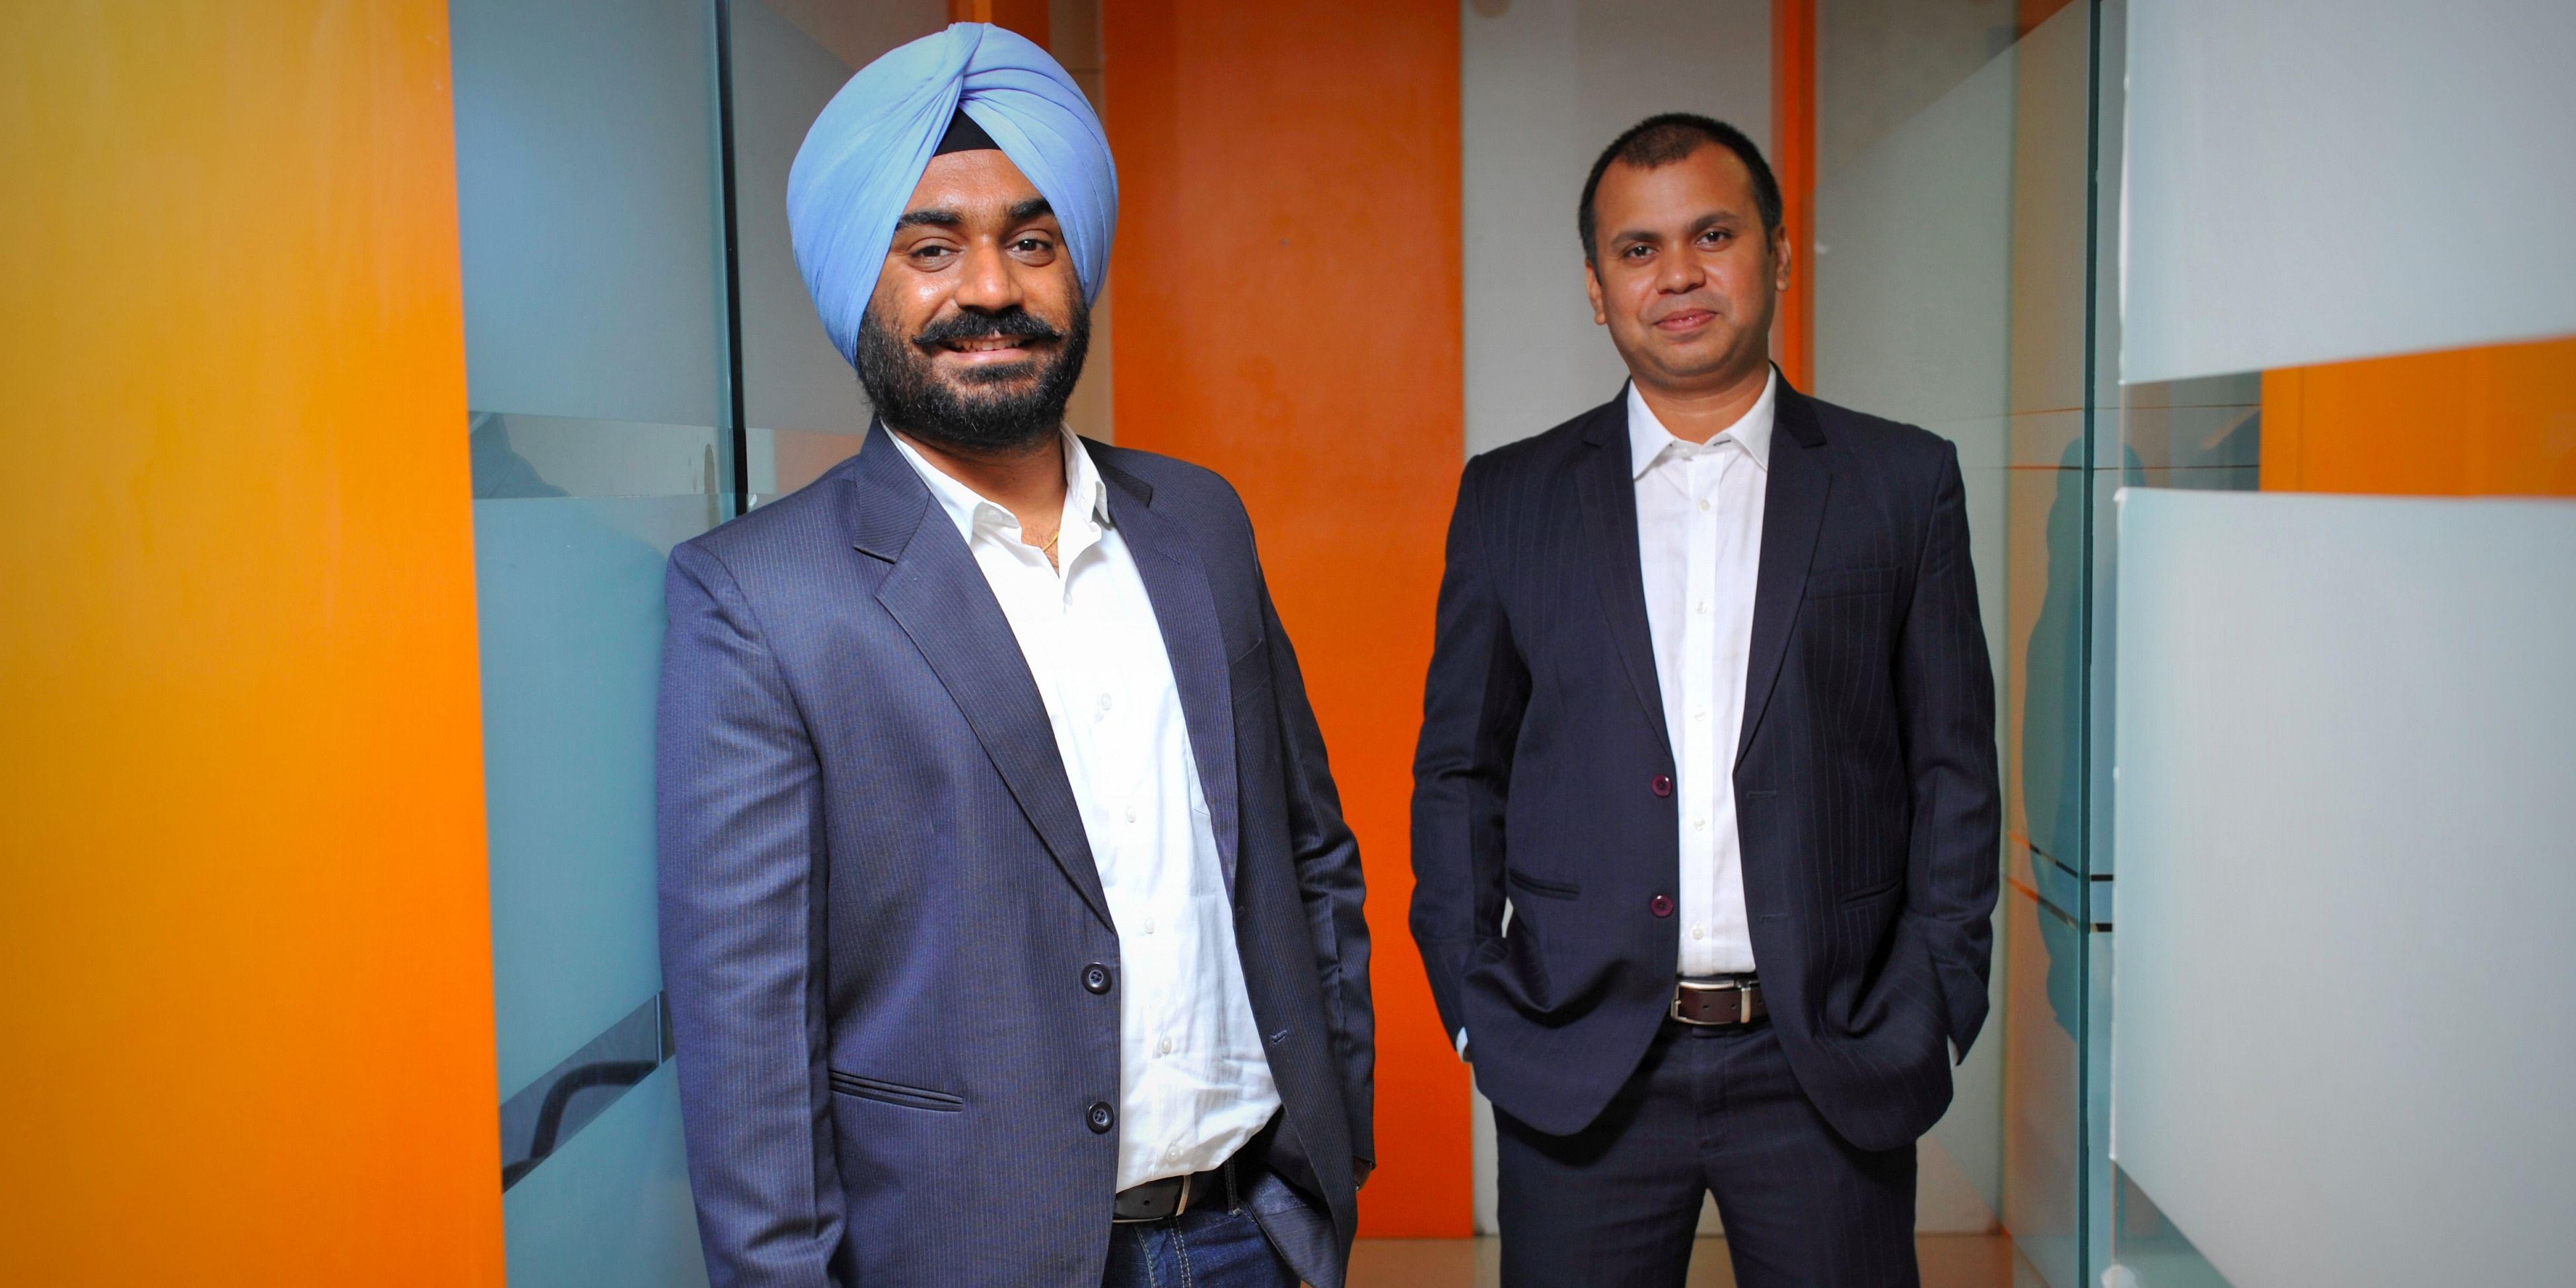 (Left) Harshdeep Rapal, CEO & Cofounder of Feelance Co. (Right) Subir Mitra, Cofounder and CTO